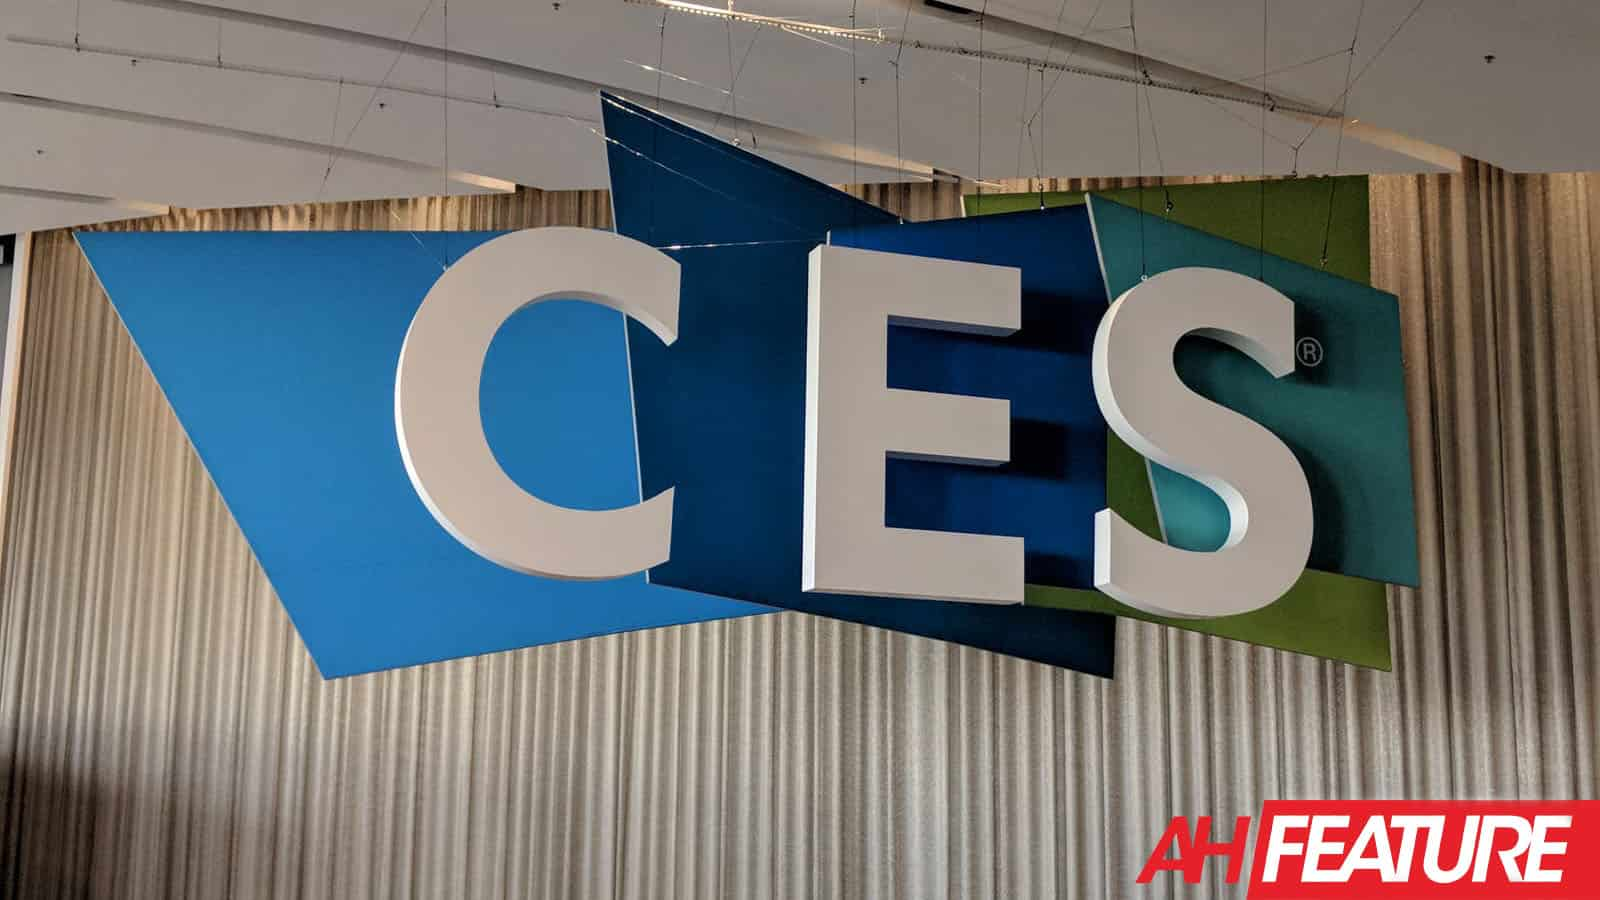 CES 2019 Logo AM AH 1 New feature